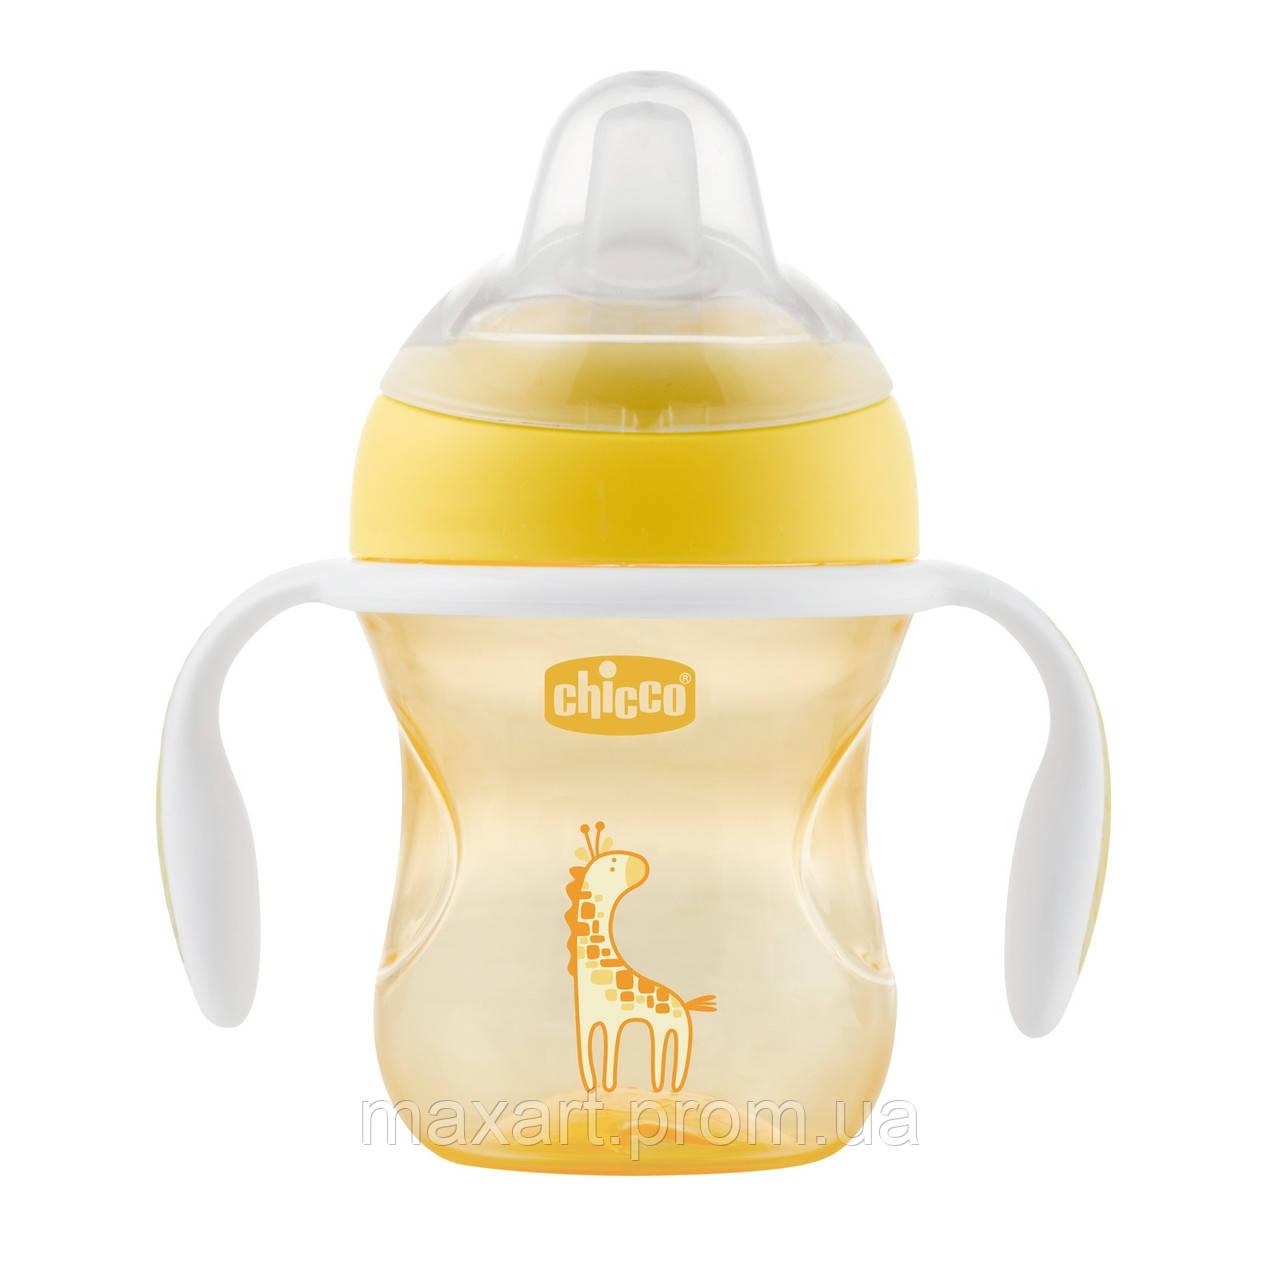 Чашка-непроливайка Chicco - Transition Cup (06911.30Y) 200 мл / 4 мес.+ / желтый